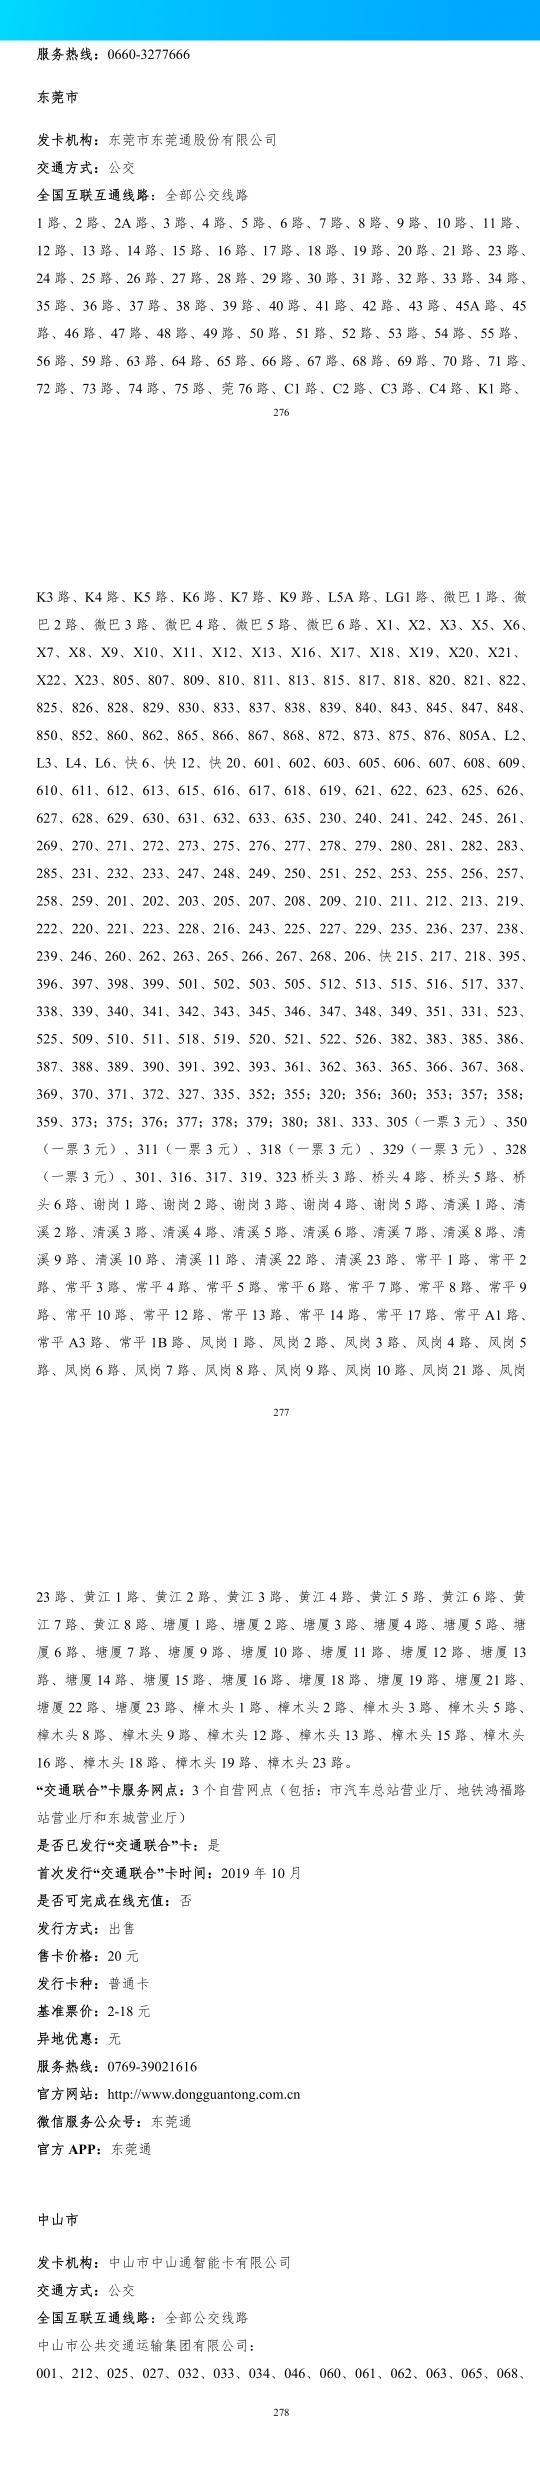 Screenshot_20200322_163431_com.tencent.mobileqq.jpg